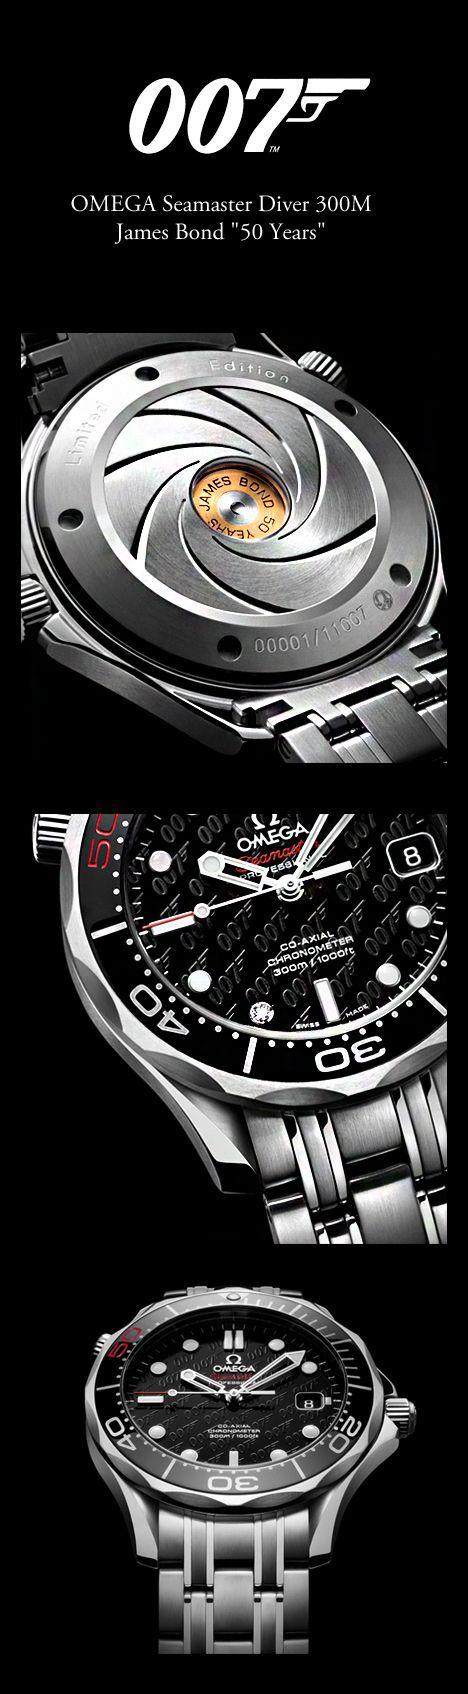 "OMEGA Seamaster Diver 300M James Bond ""50 Years"""